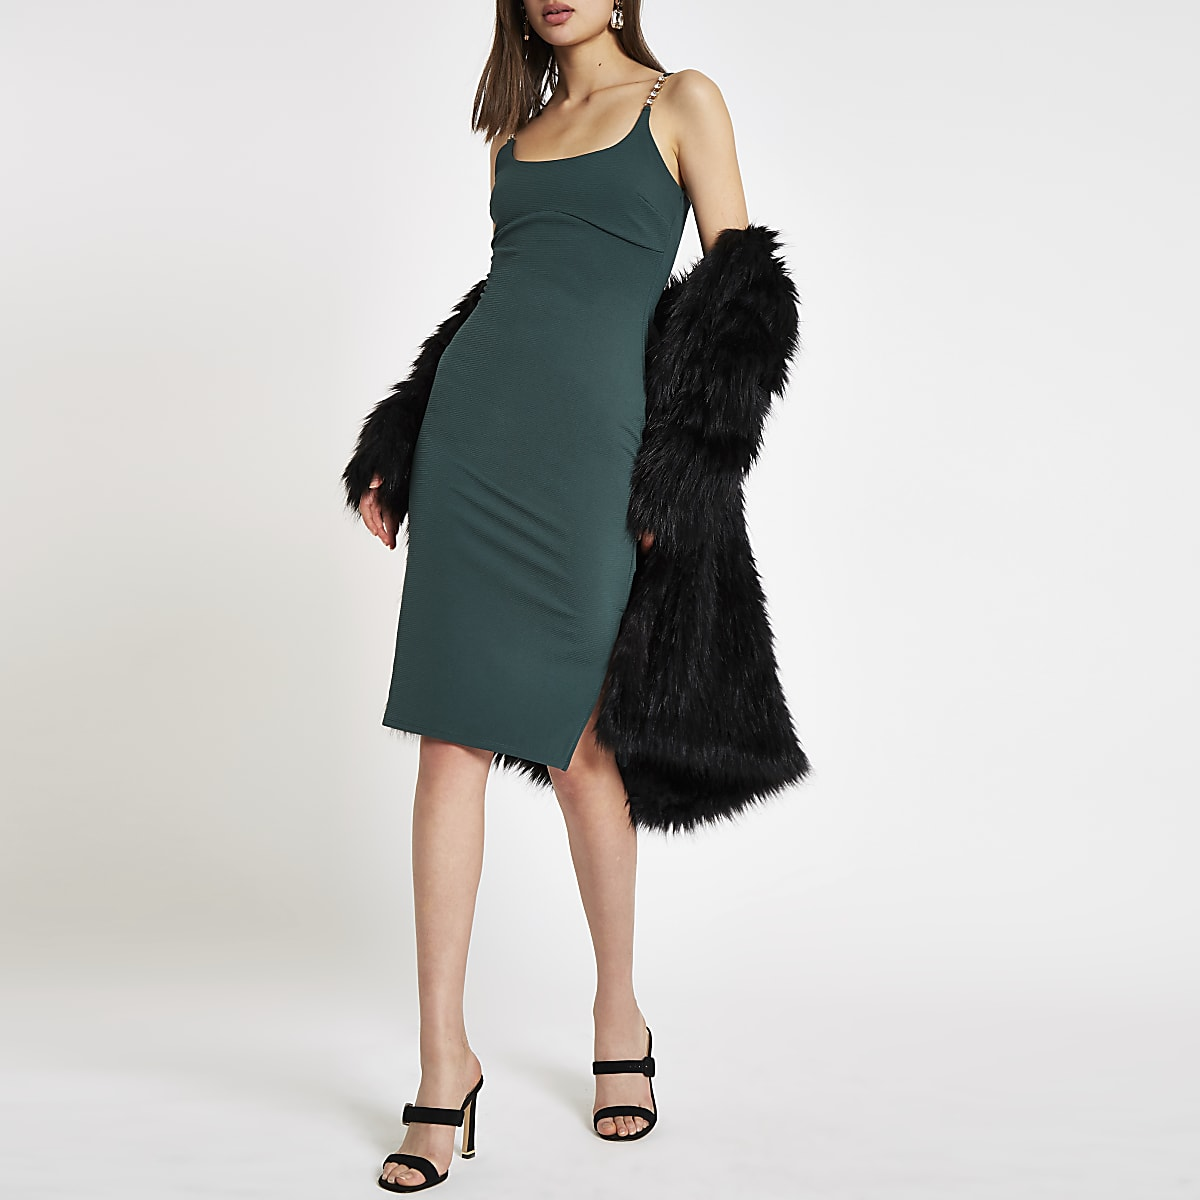 Dark green ribbed rhinestone trim bodycon dress